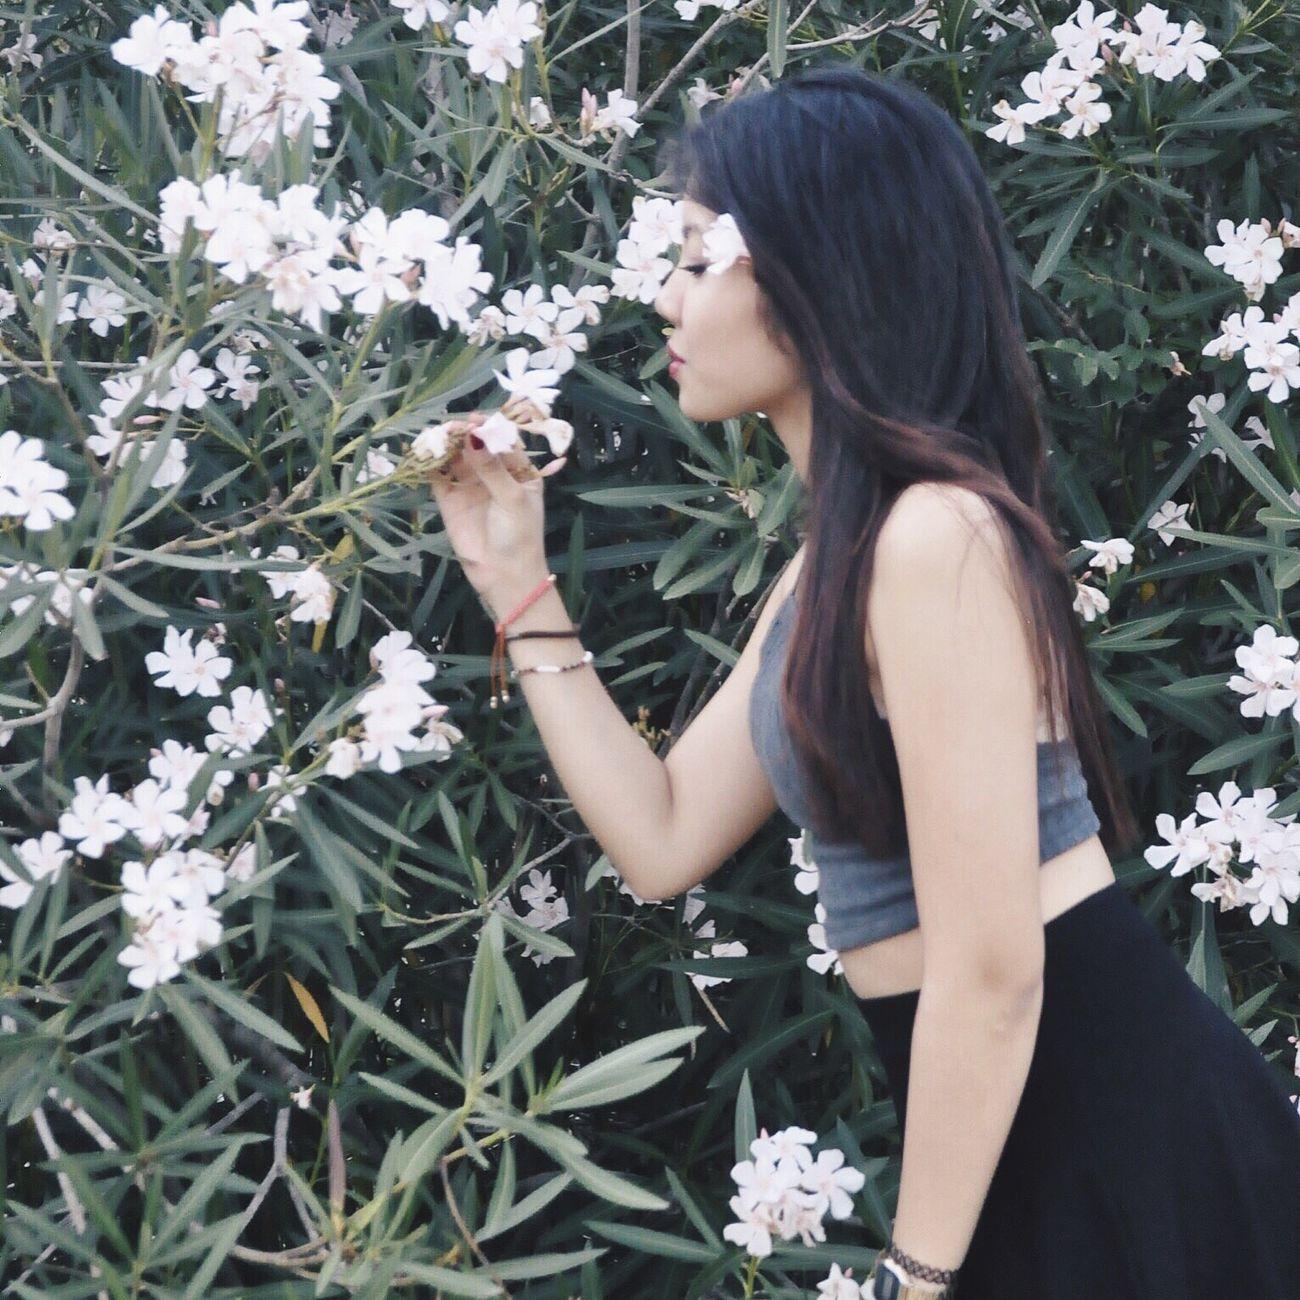 Photoshoot Taking Photos Flowers Girl Girls Asian  Filipina Pinay Filipino Fashion